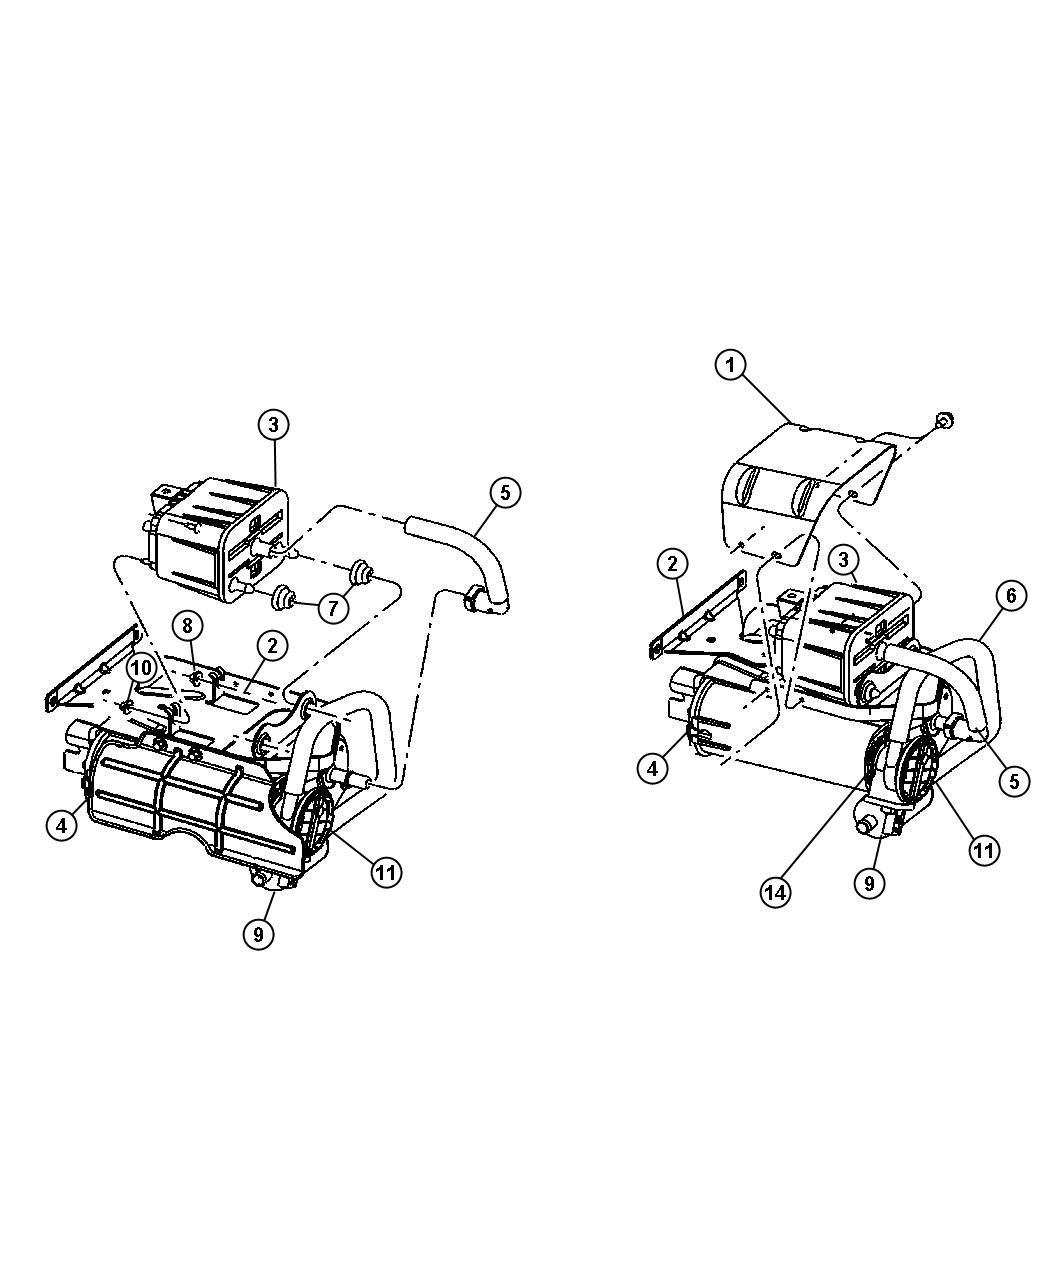 Dodge Ram Canister Vapor Gallon Fuel Tank